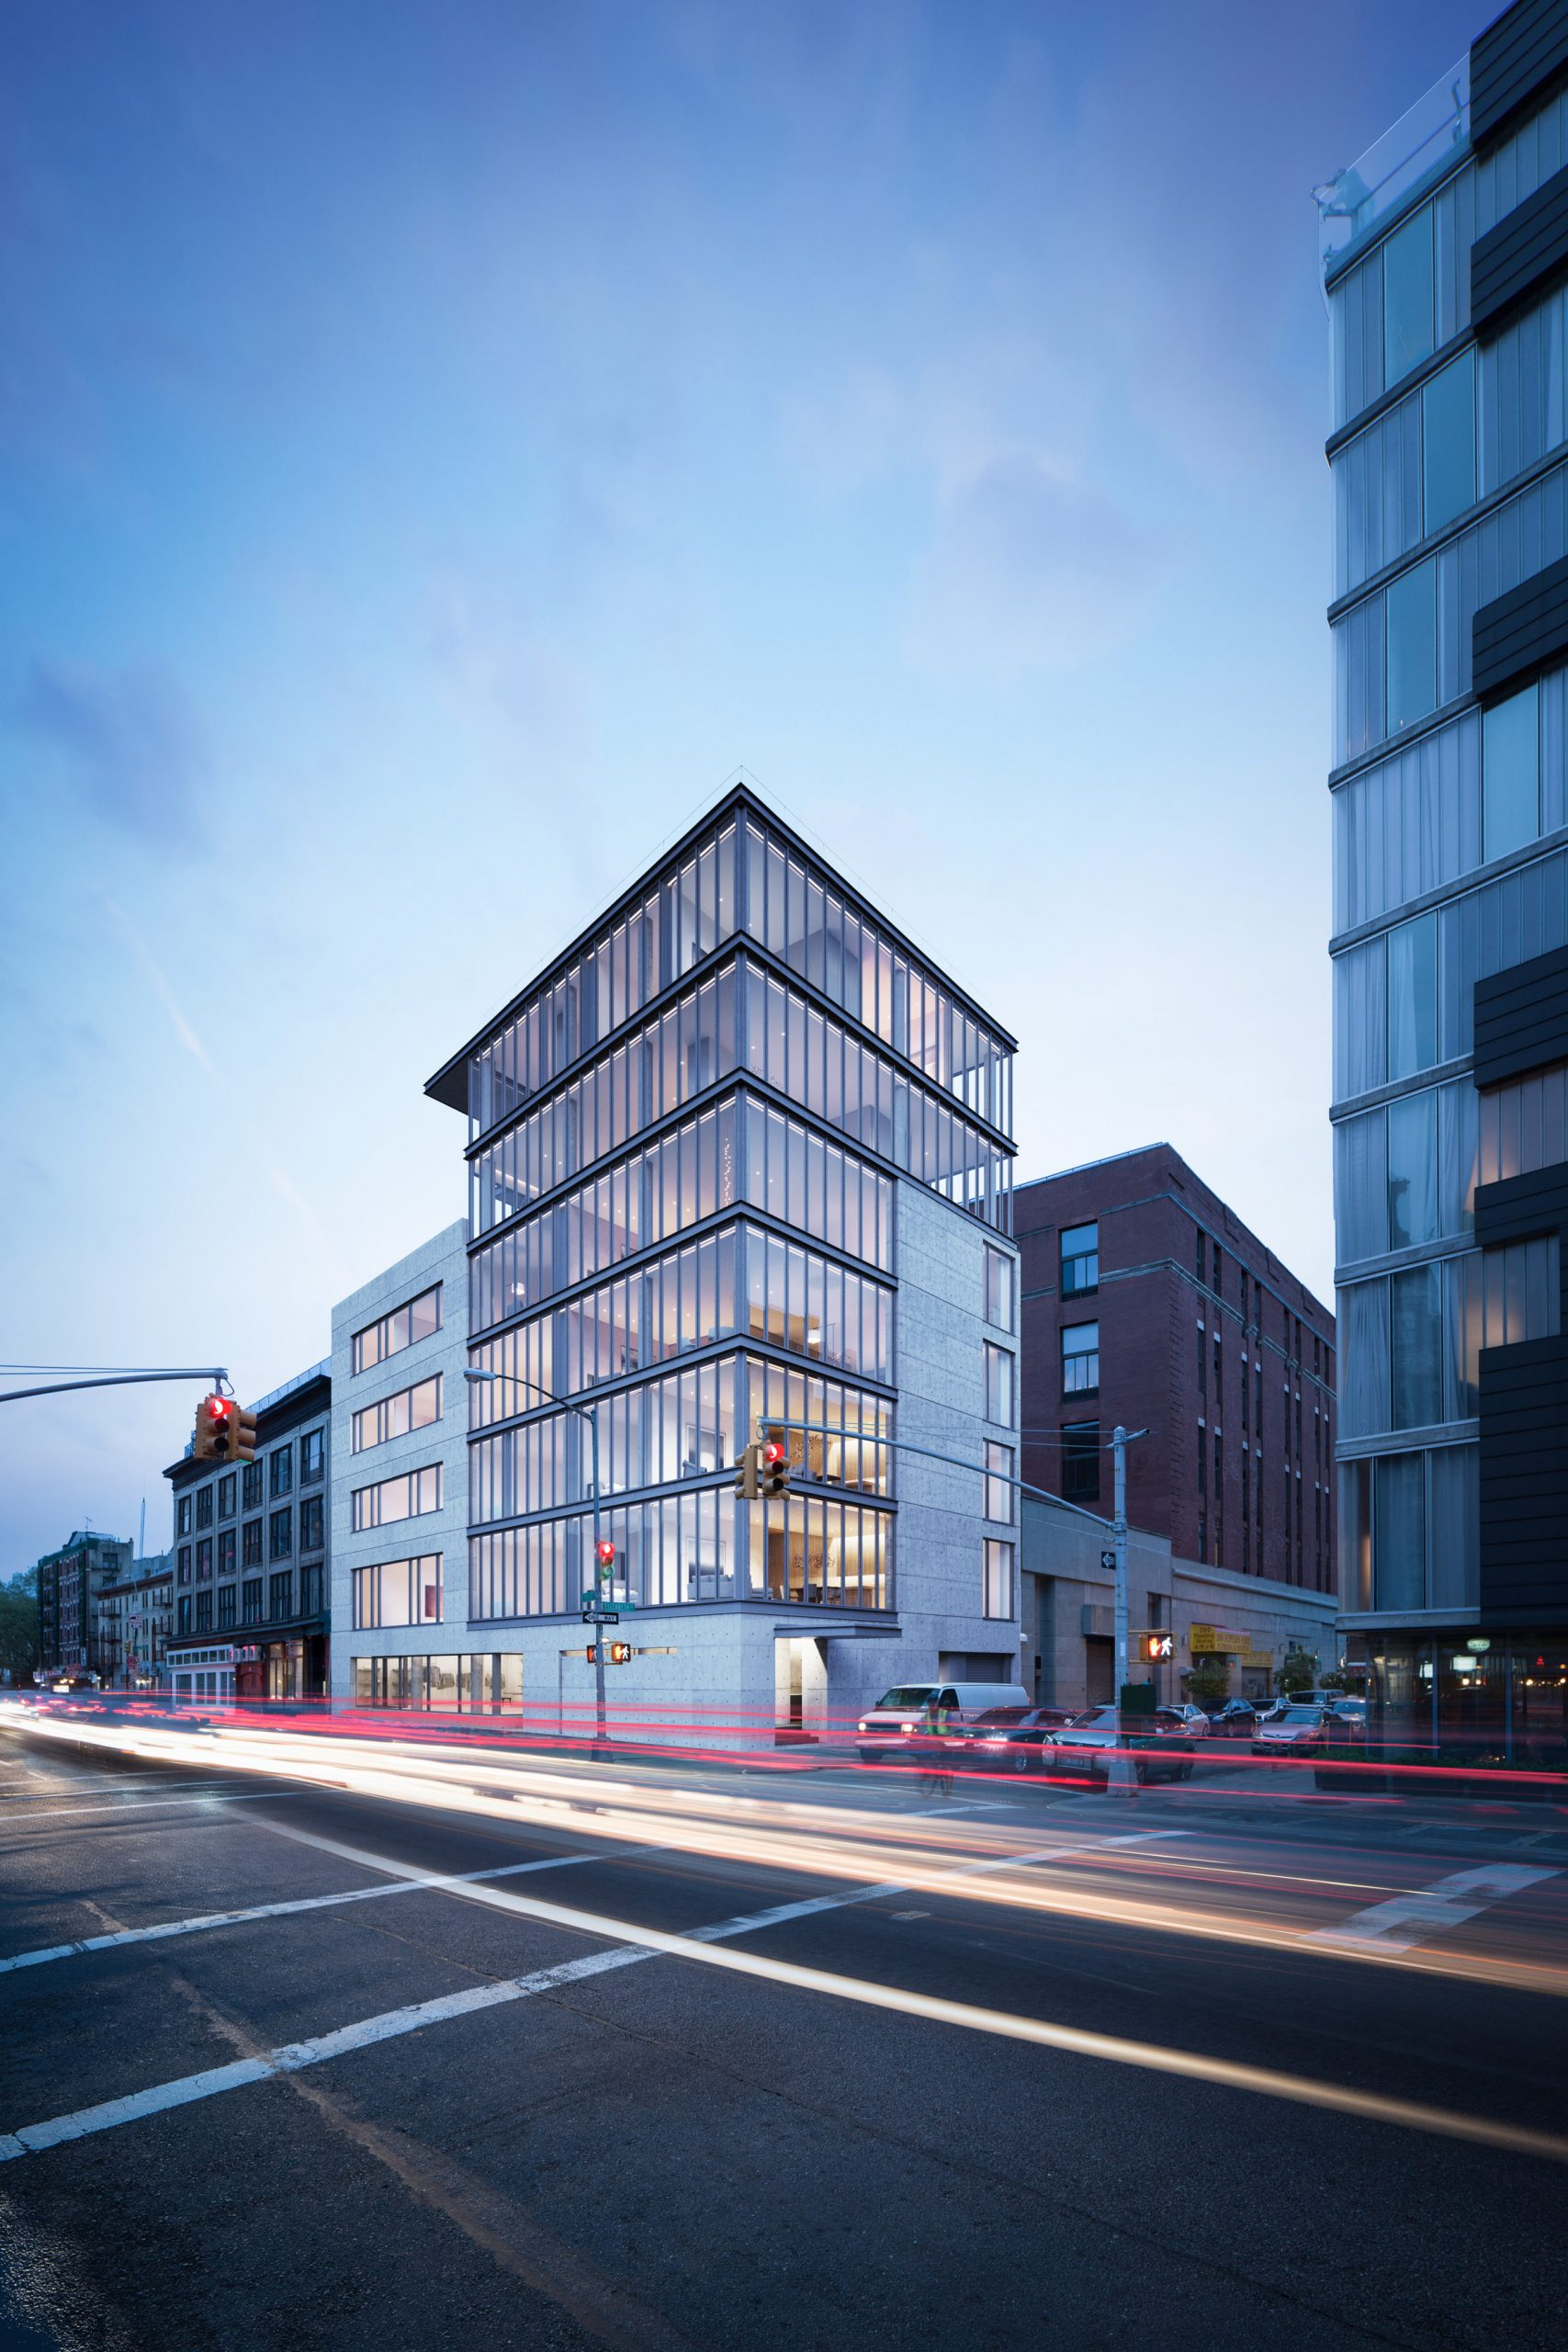 Thiết kế nội thất căn hộ Duplex 6